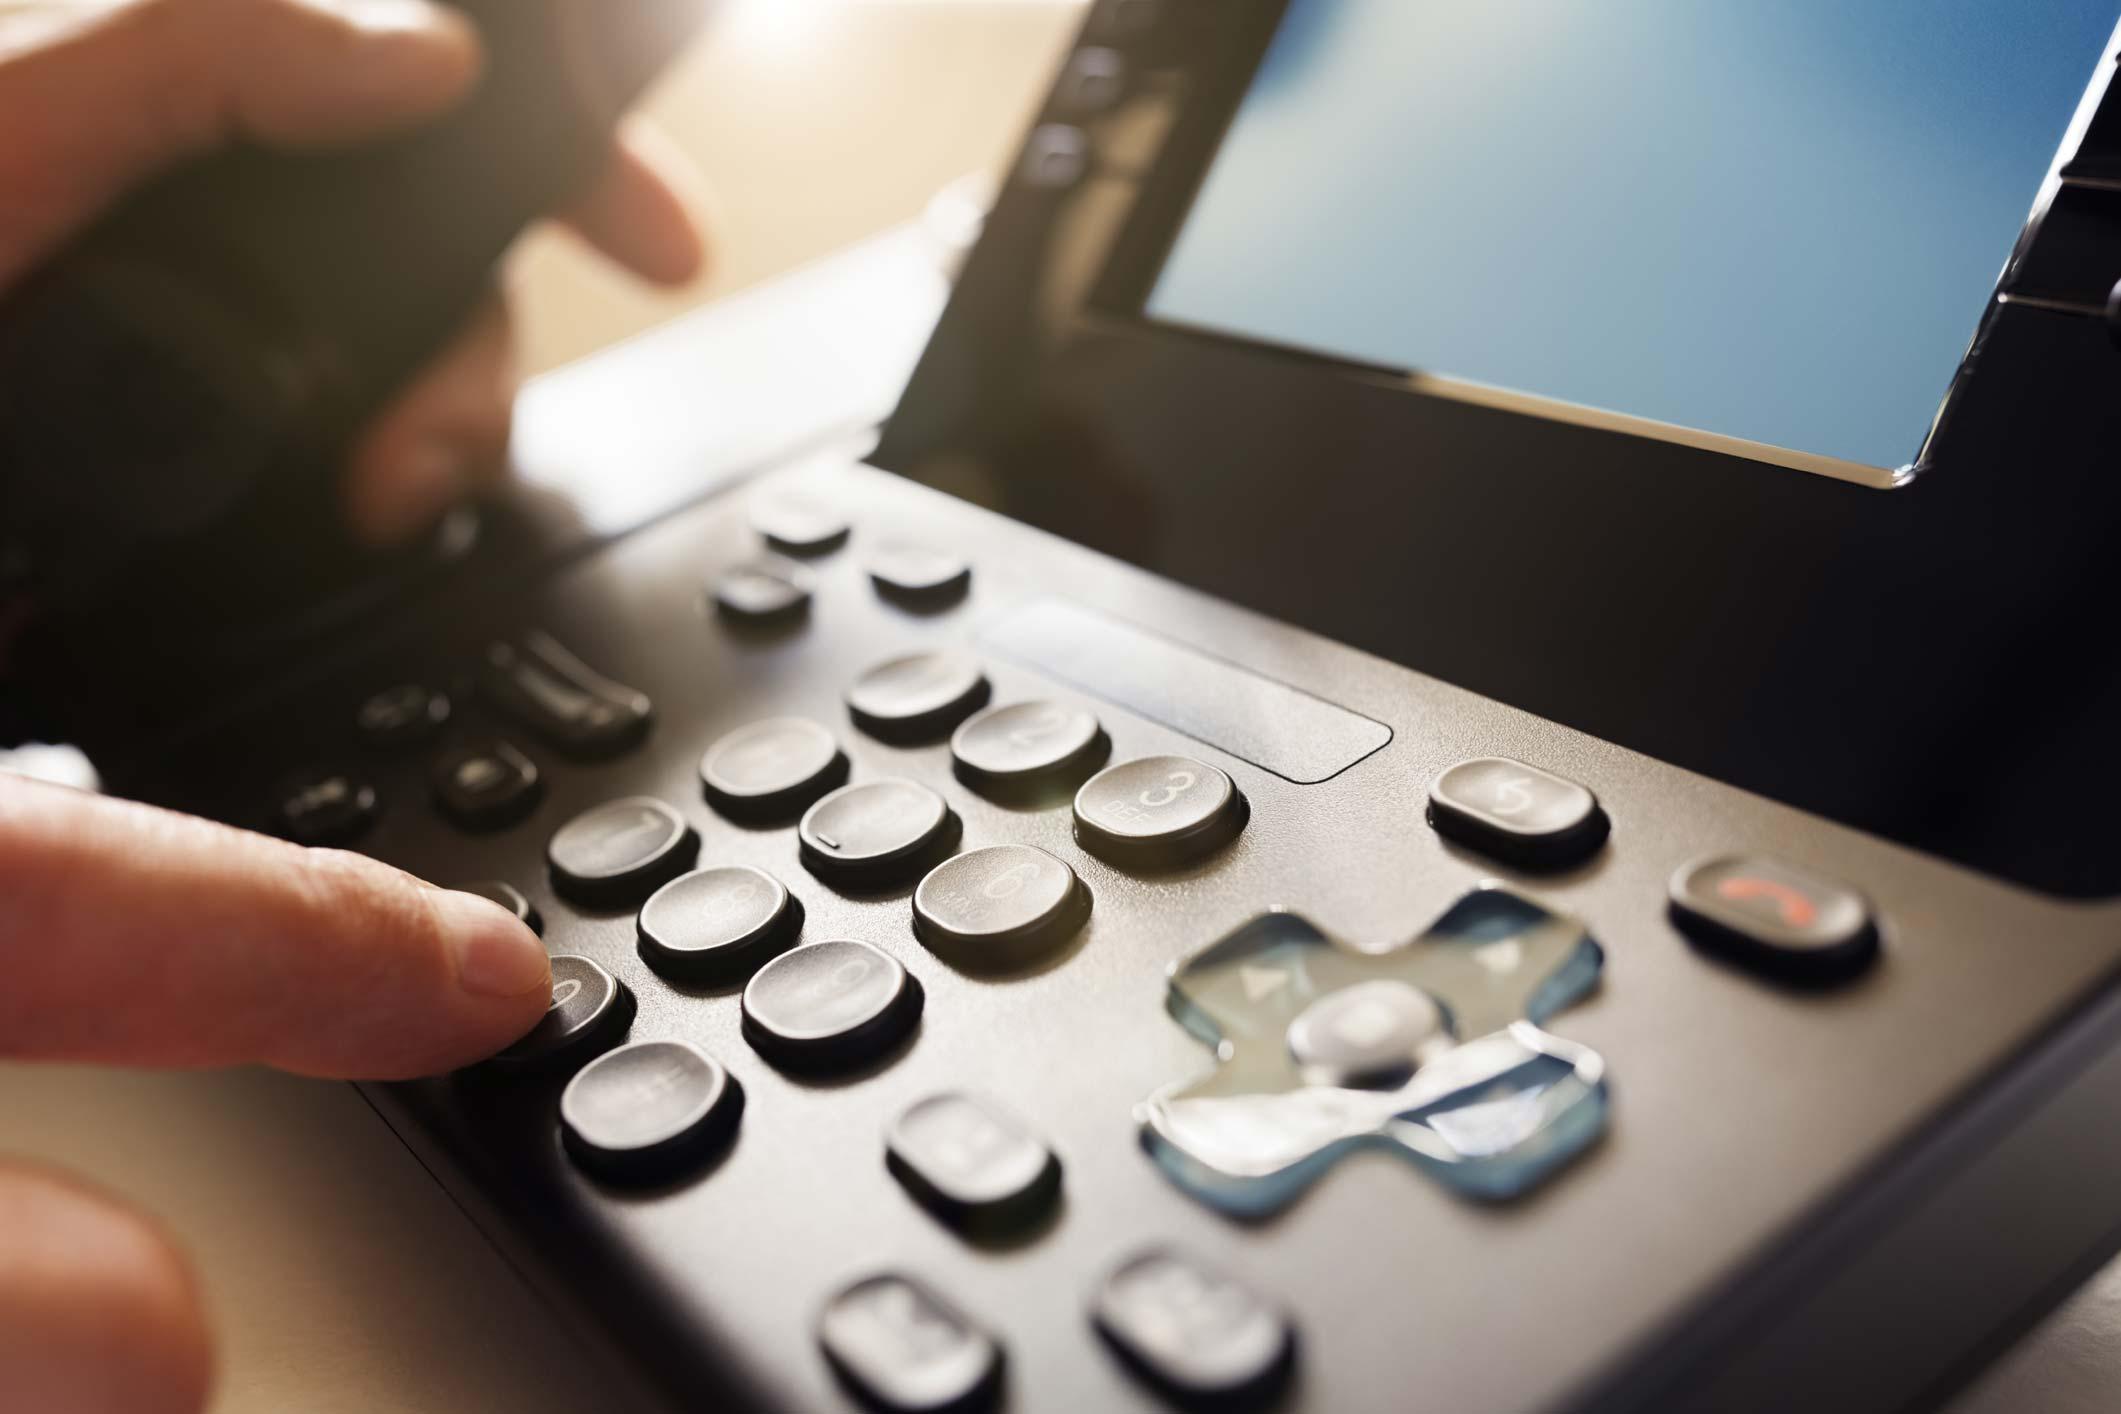 VoIP Provider in the DMV Area